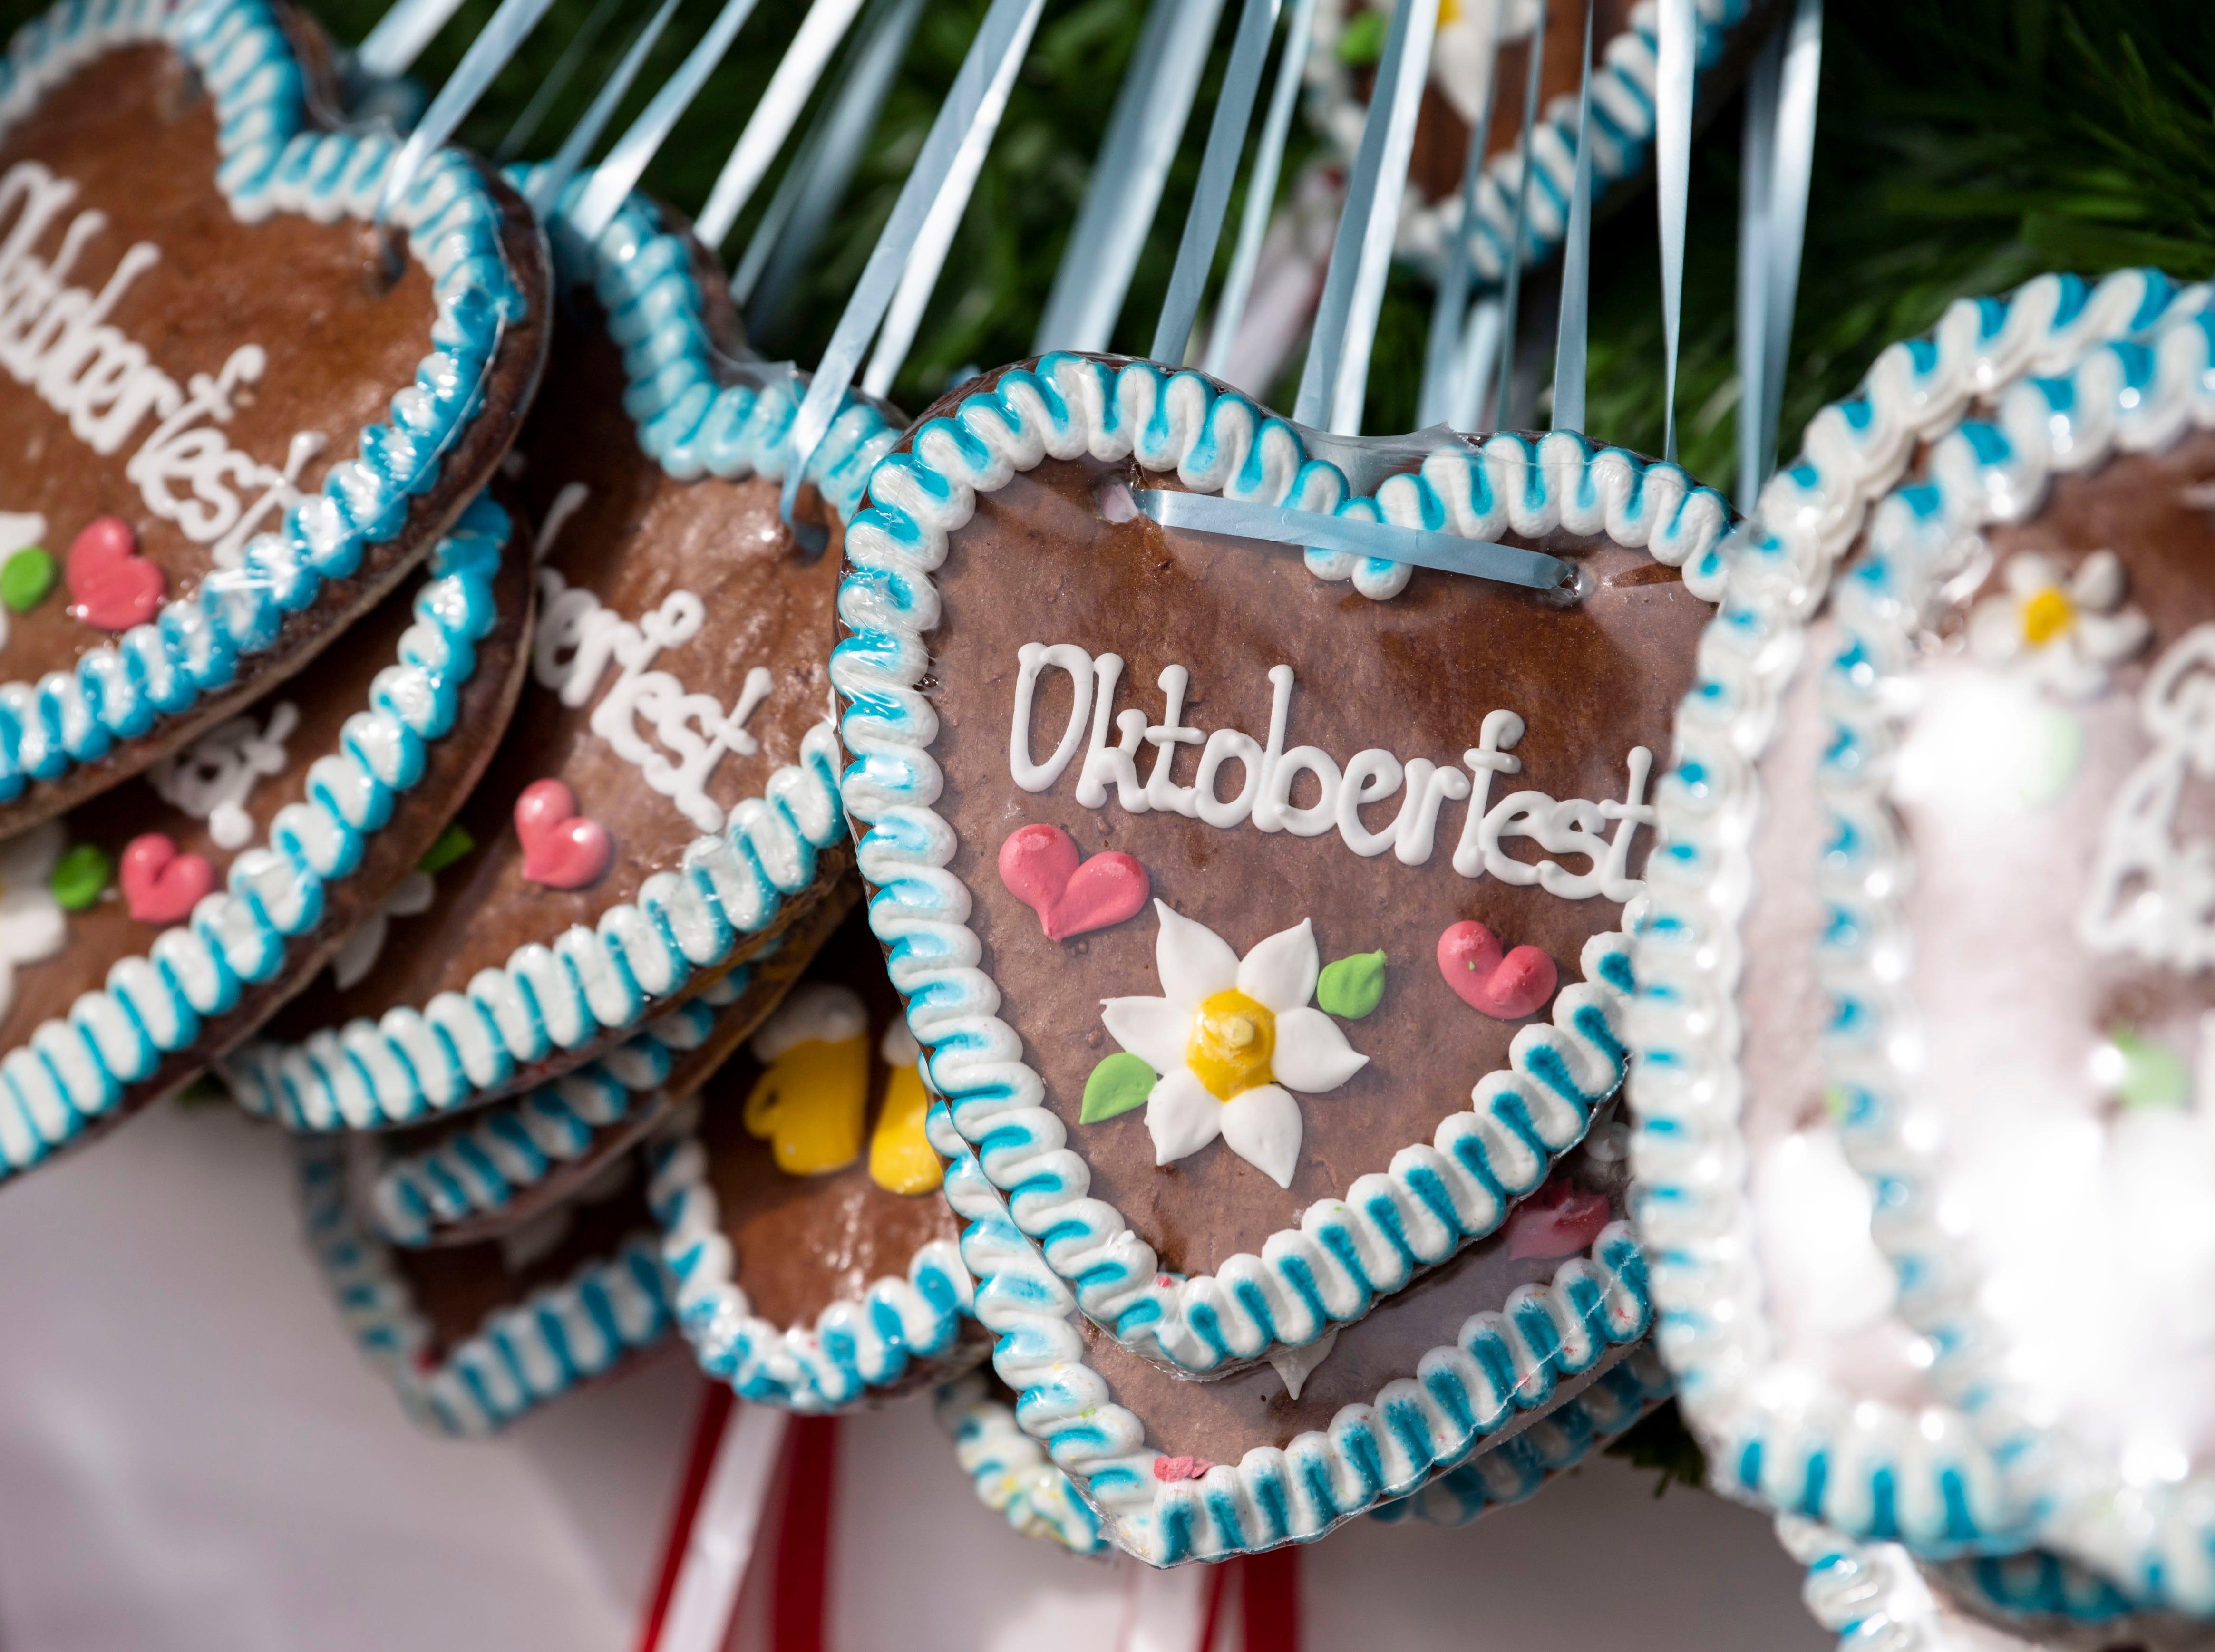 A close-up of Oktoberfest gingerbread hearts.